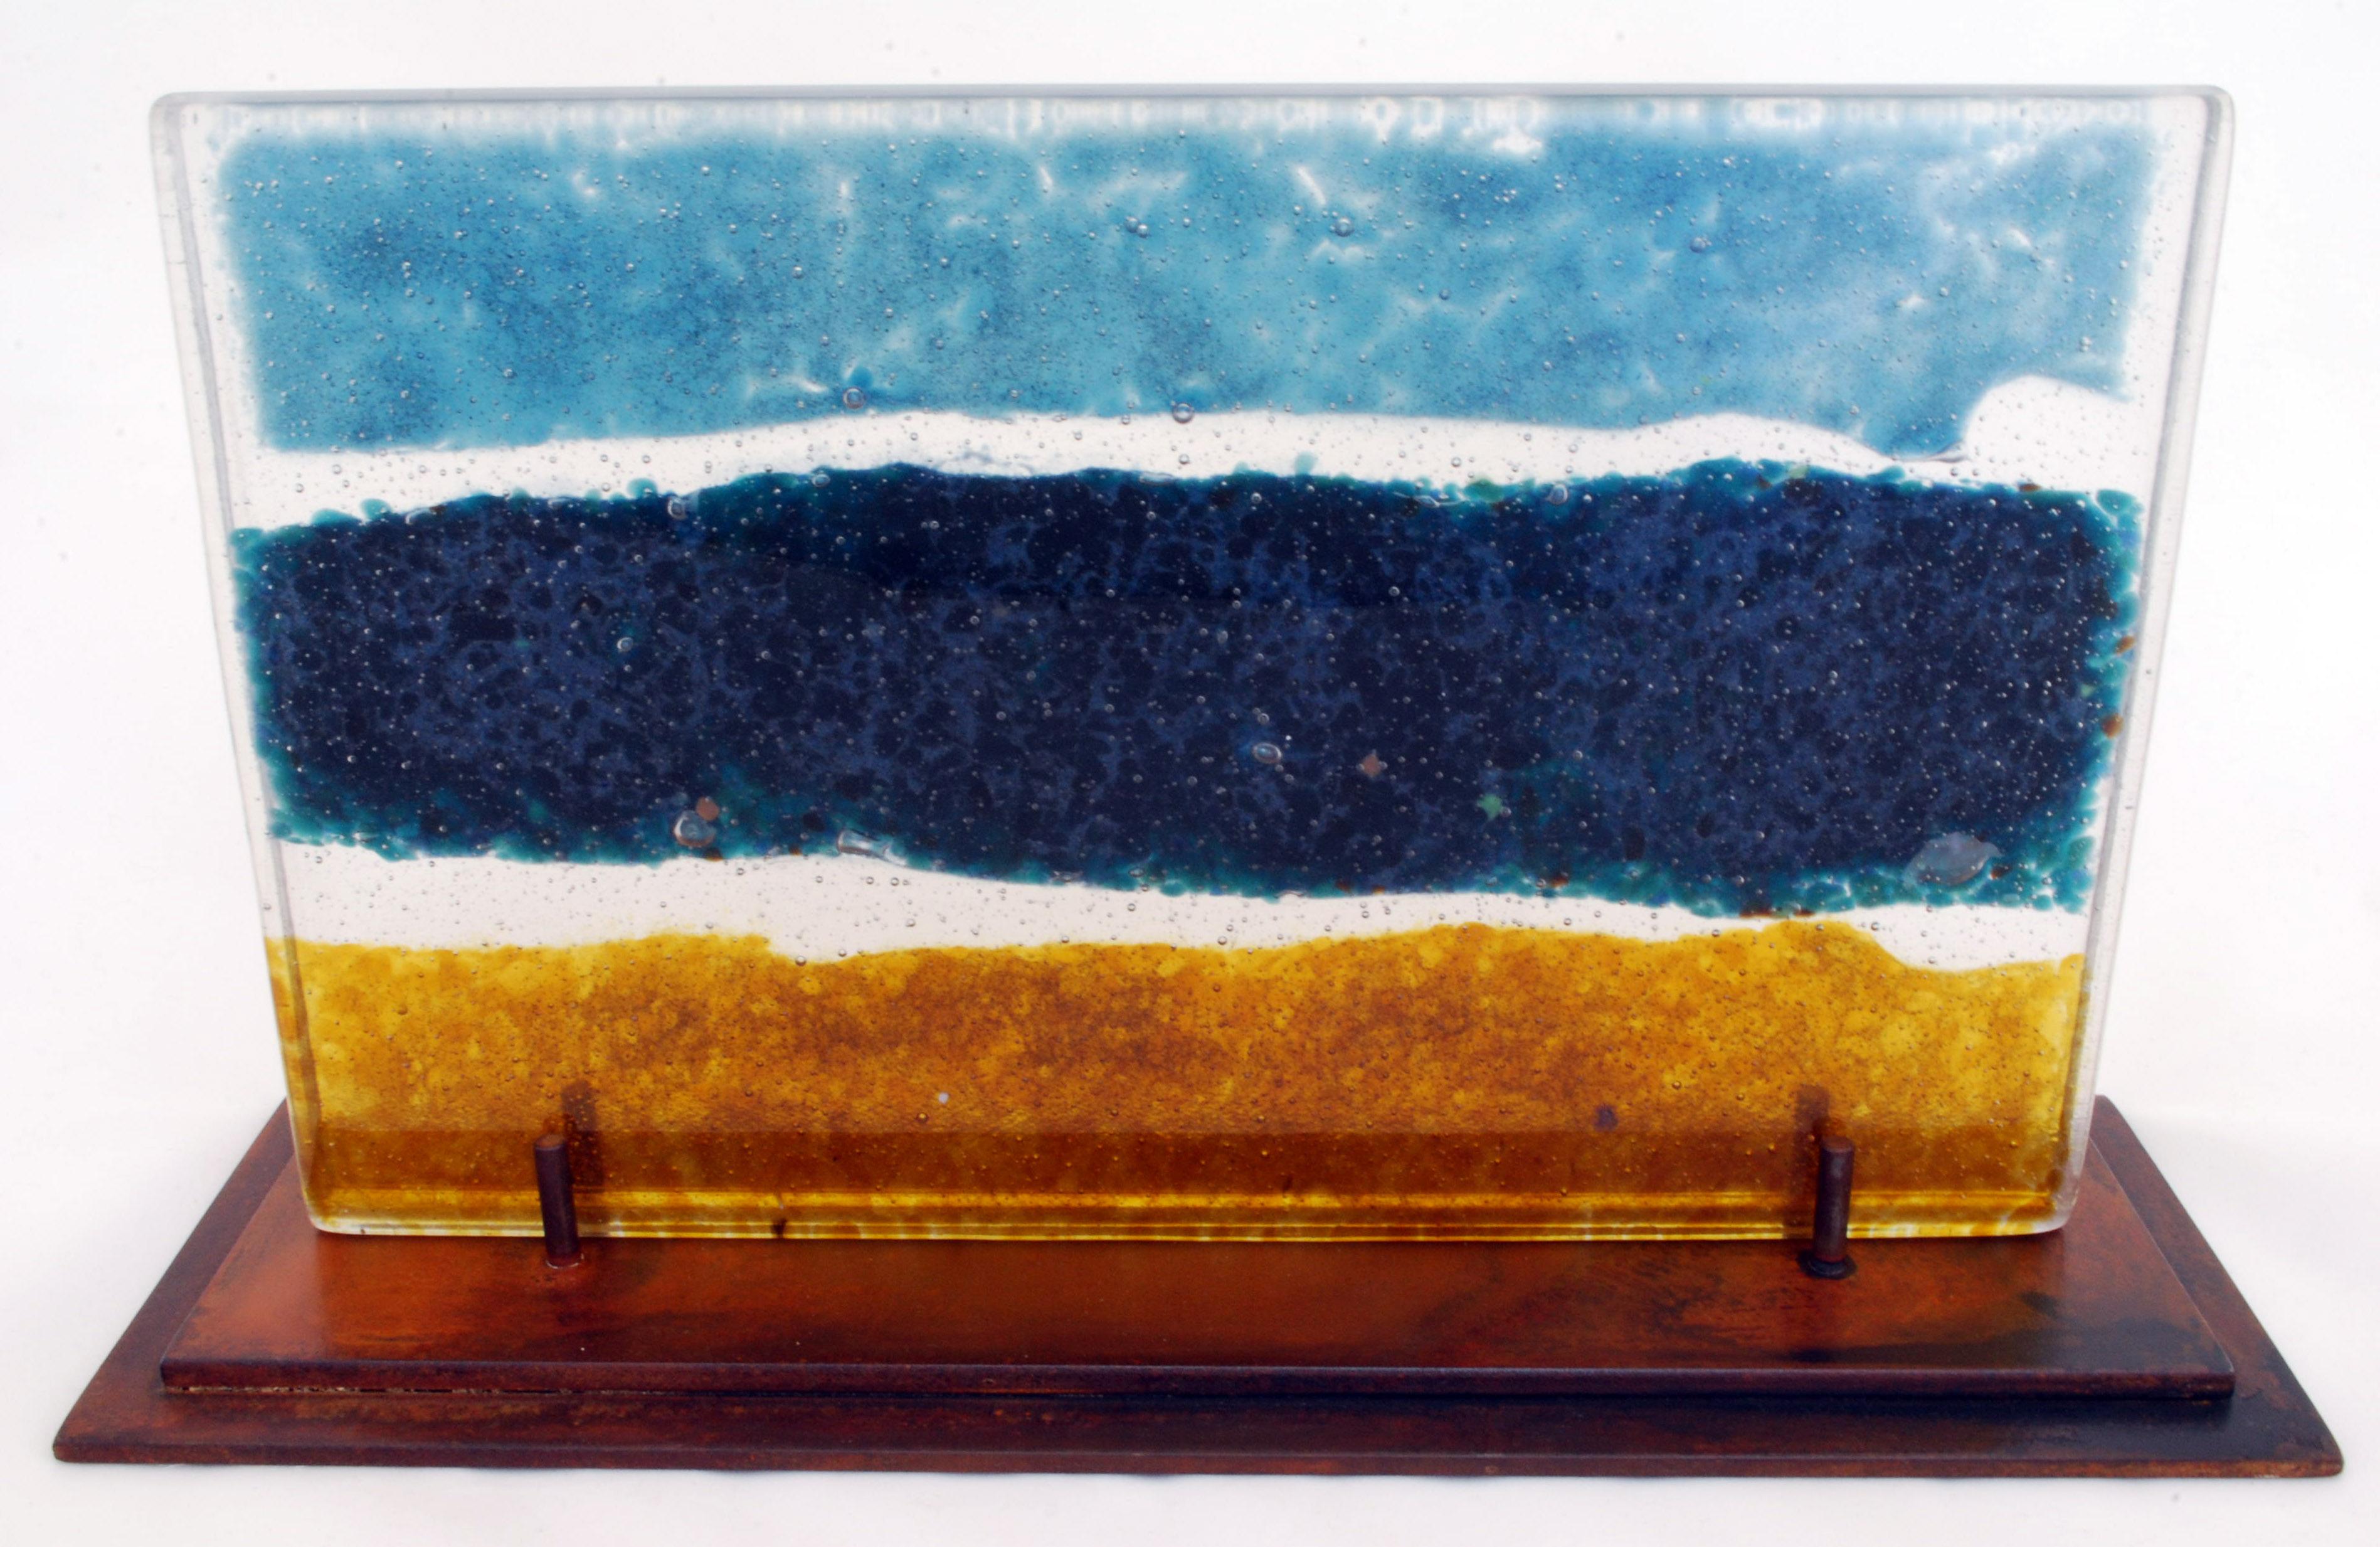 Seascape, glass sculpture